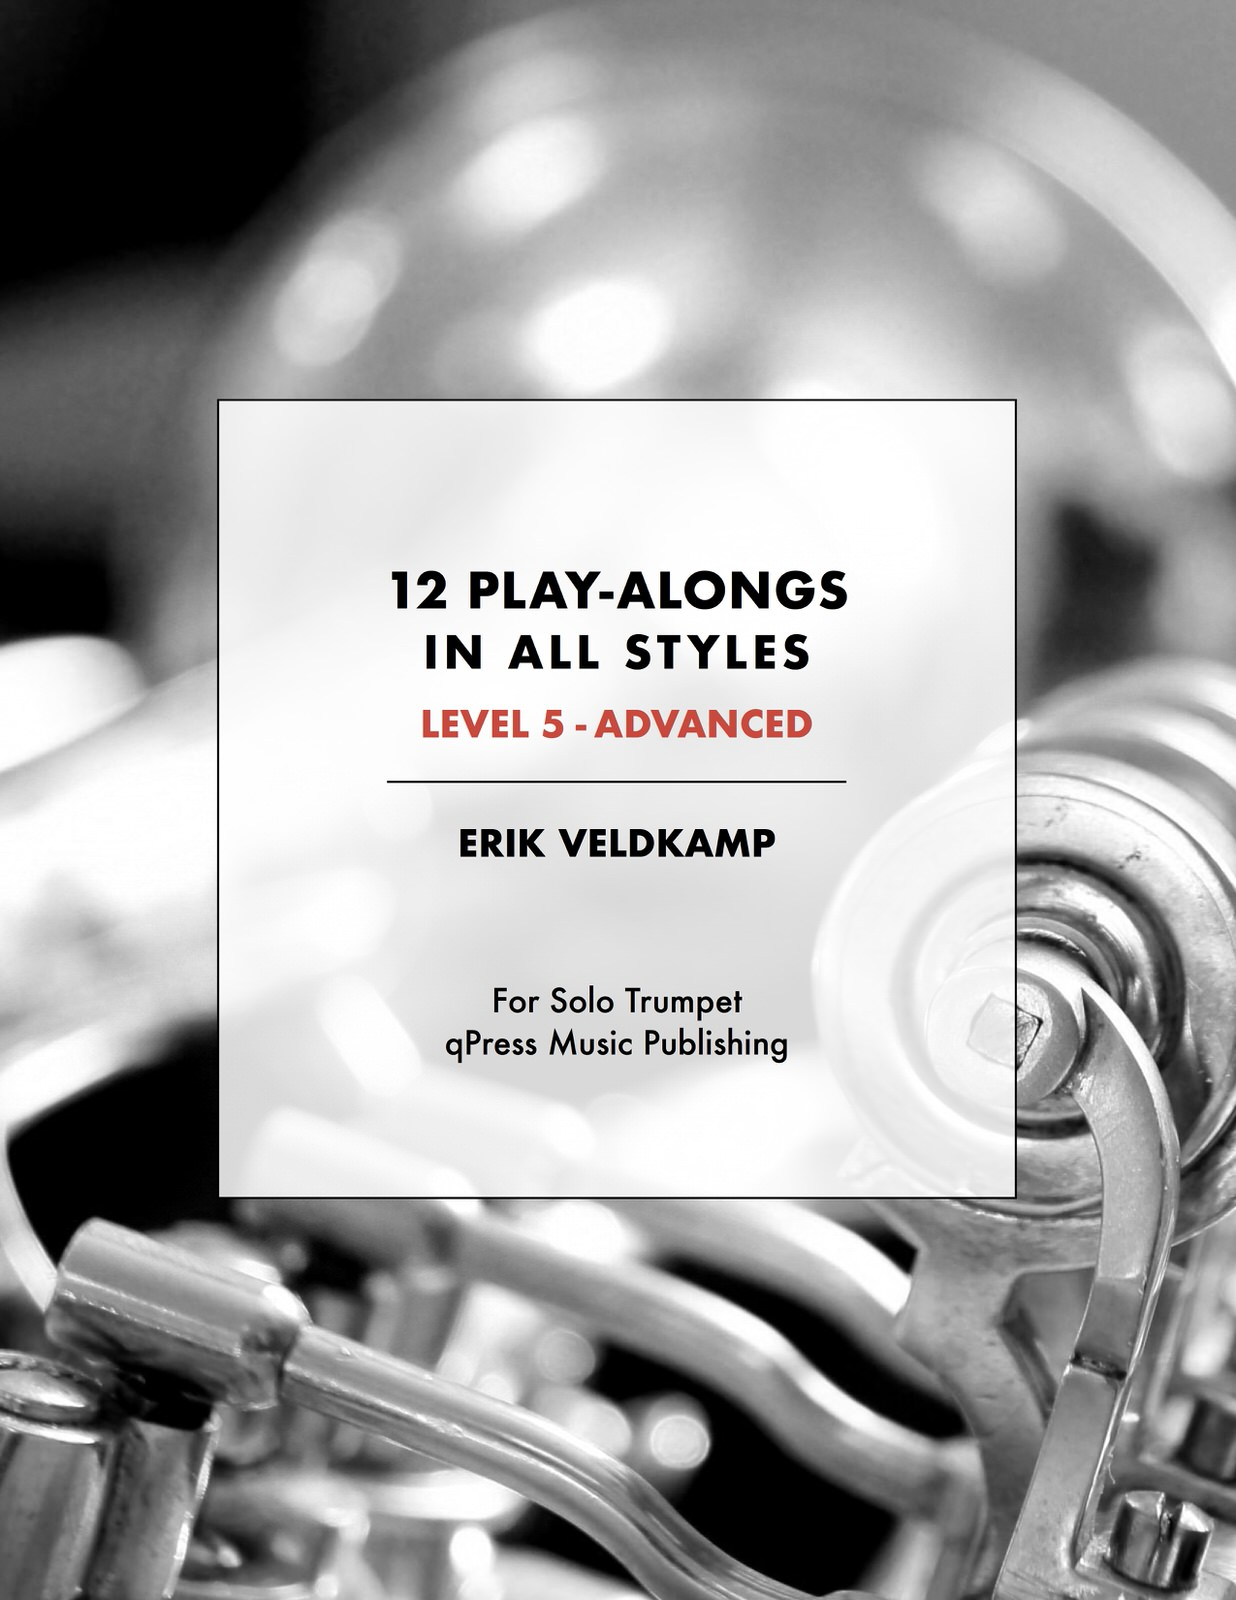 Veldkamp, 12 Play-Alongs in All Styles Level 5 (Advanced)-p01